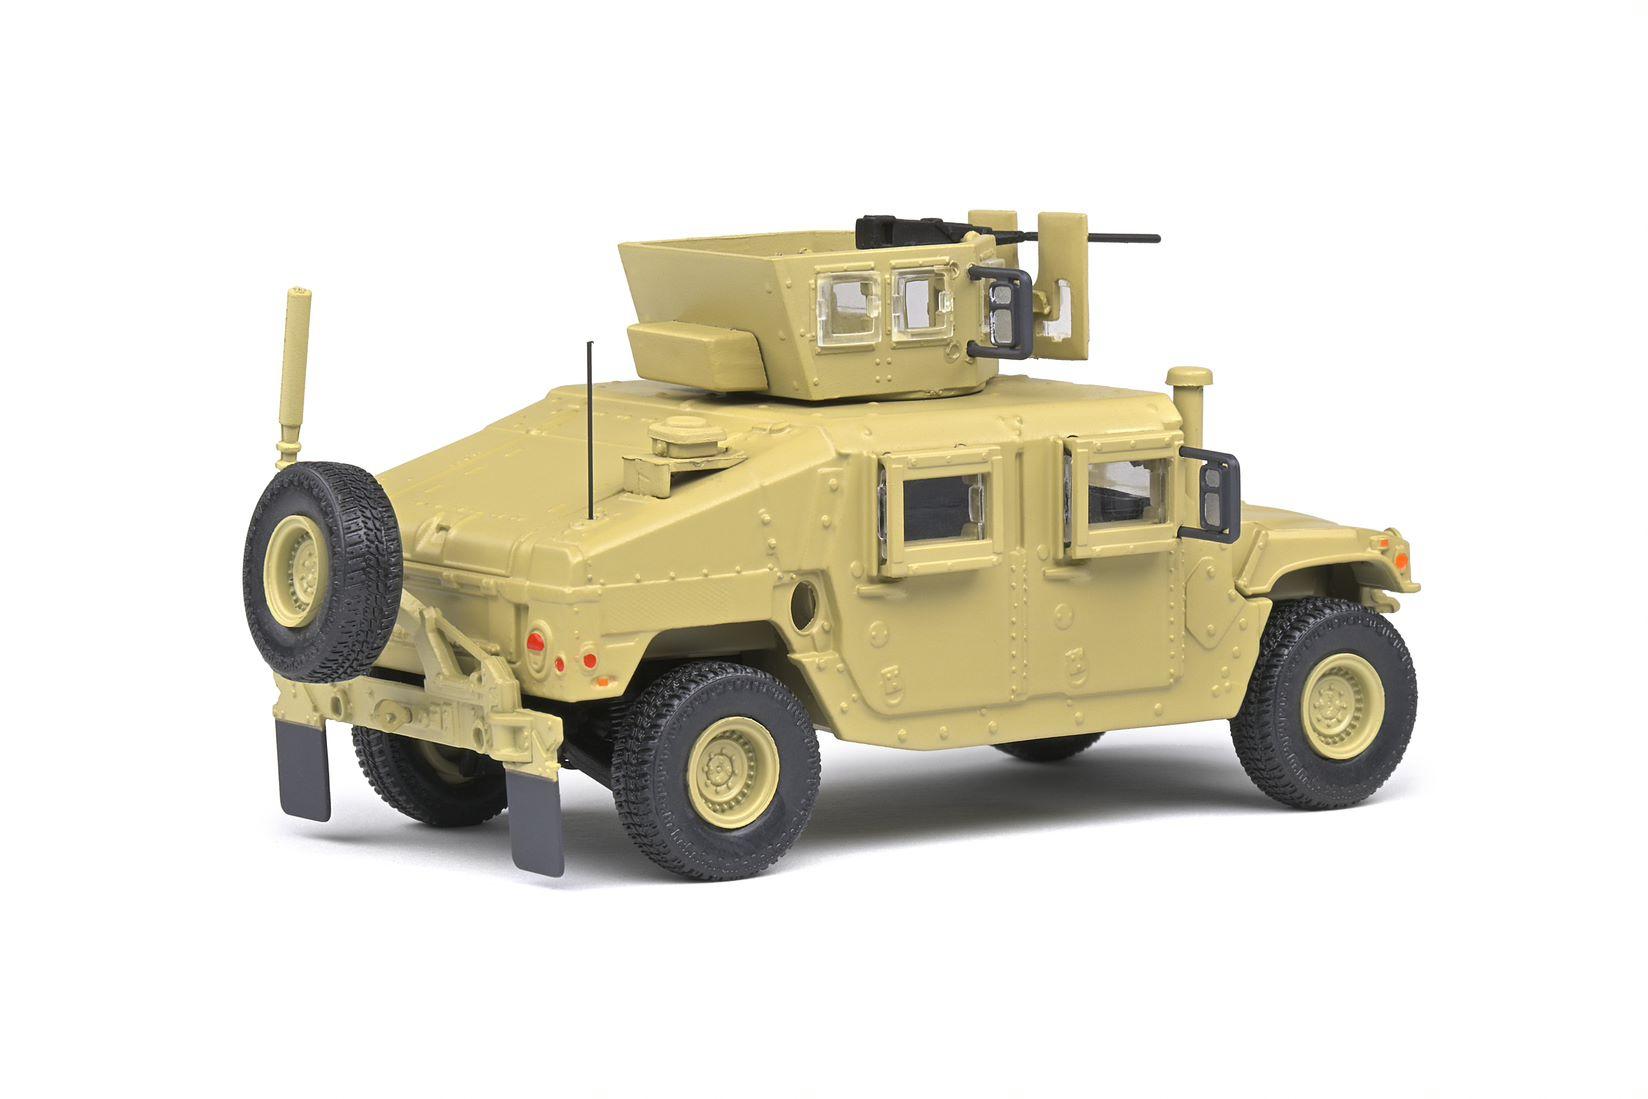 M1115 HUMVEE DESERT CAMO